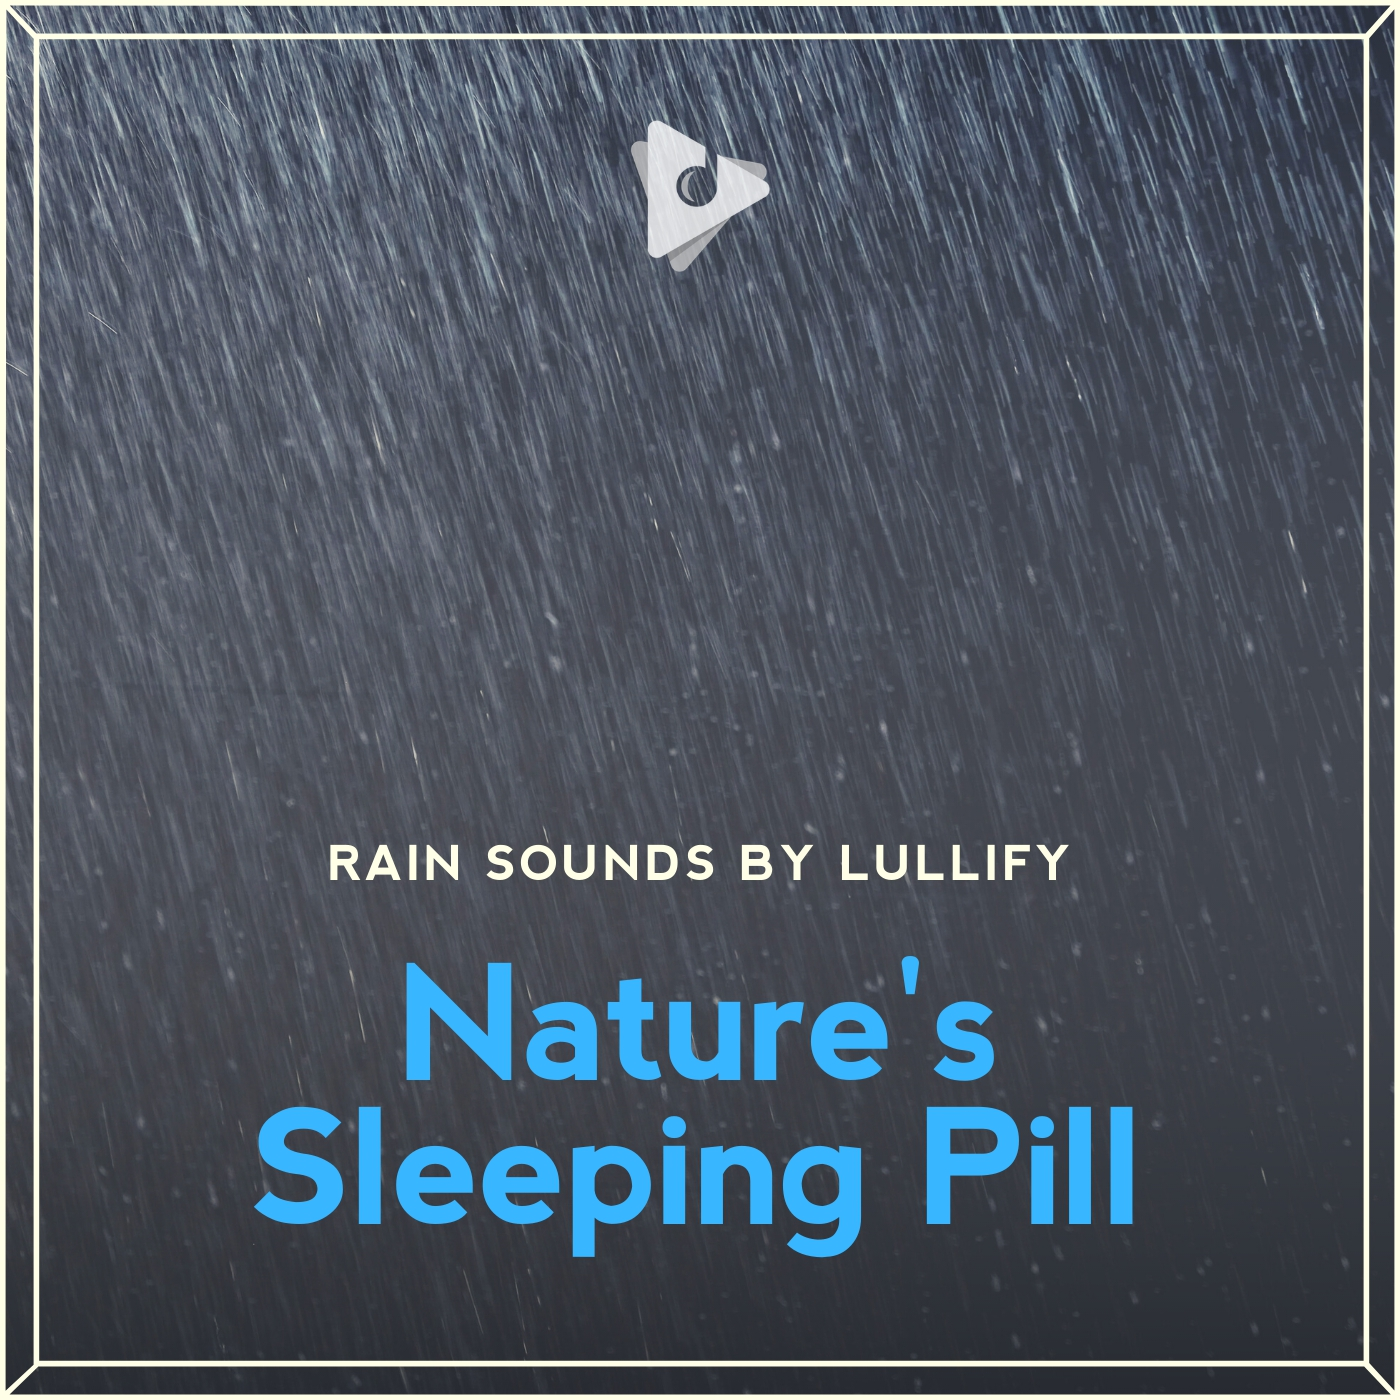 Nature's Sleeping Pill